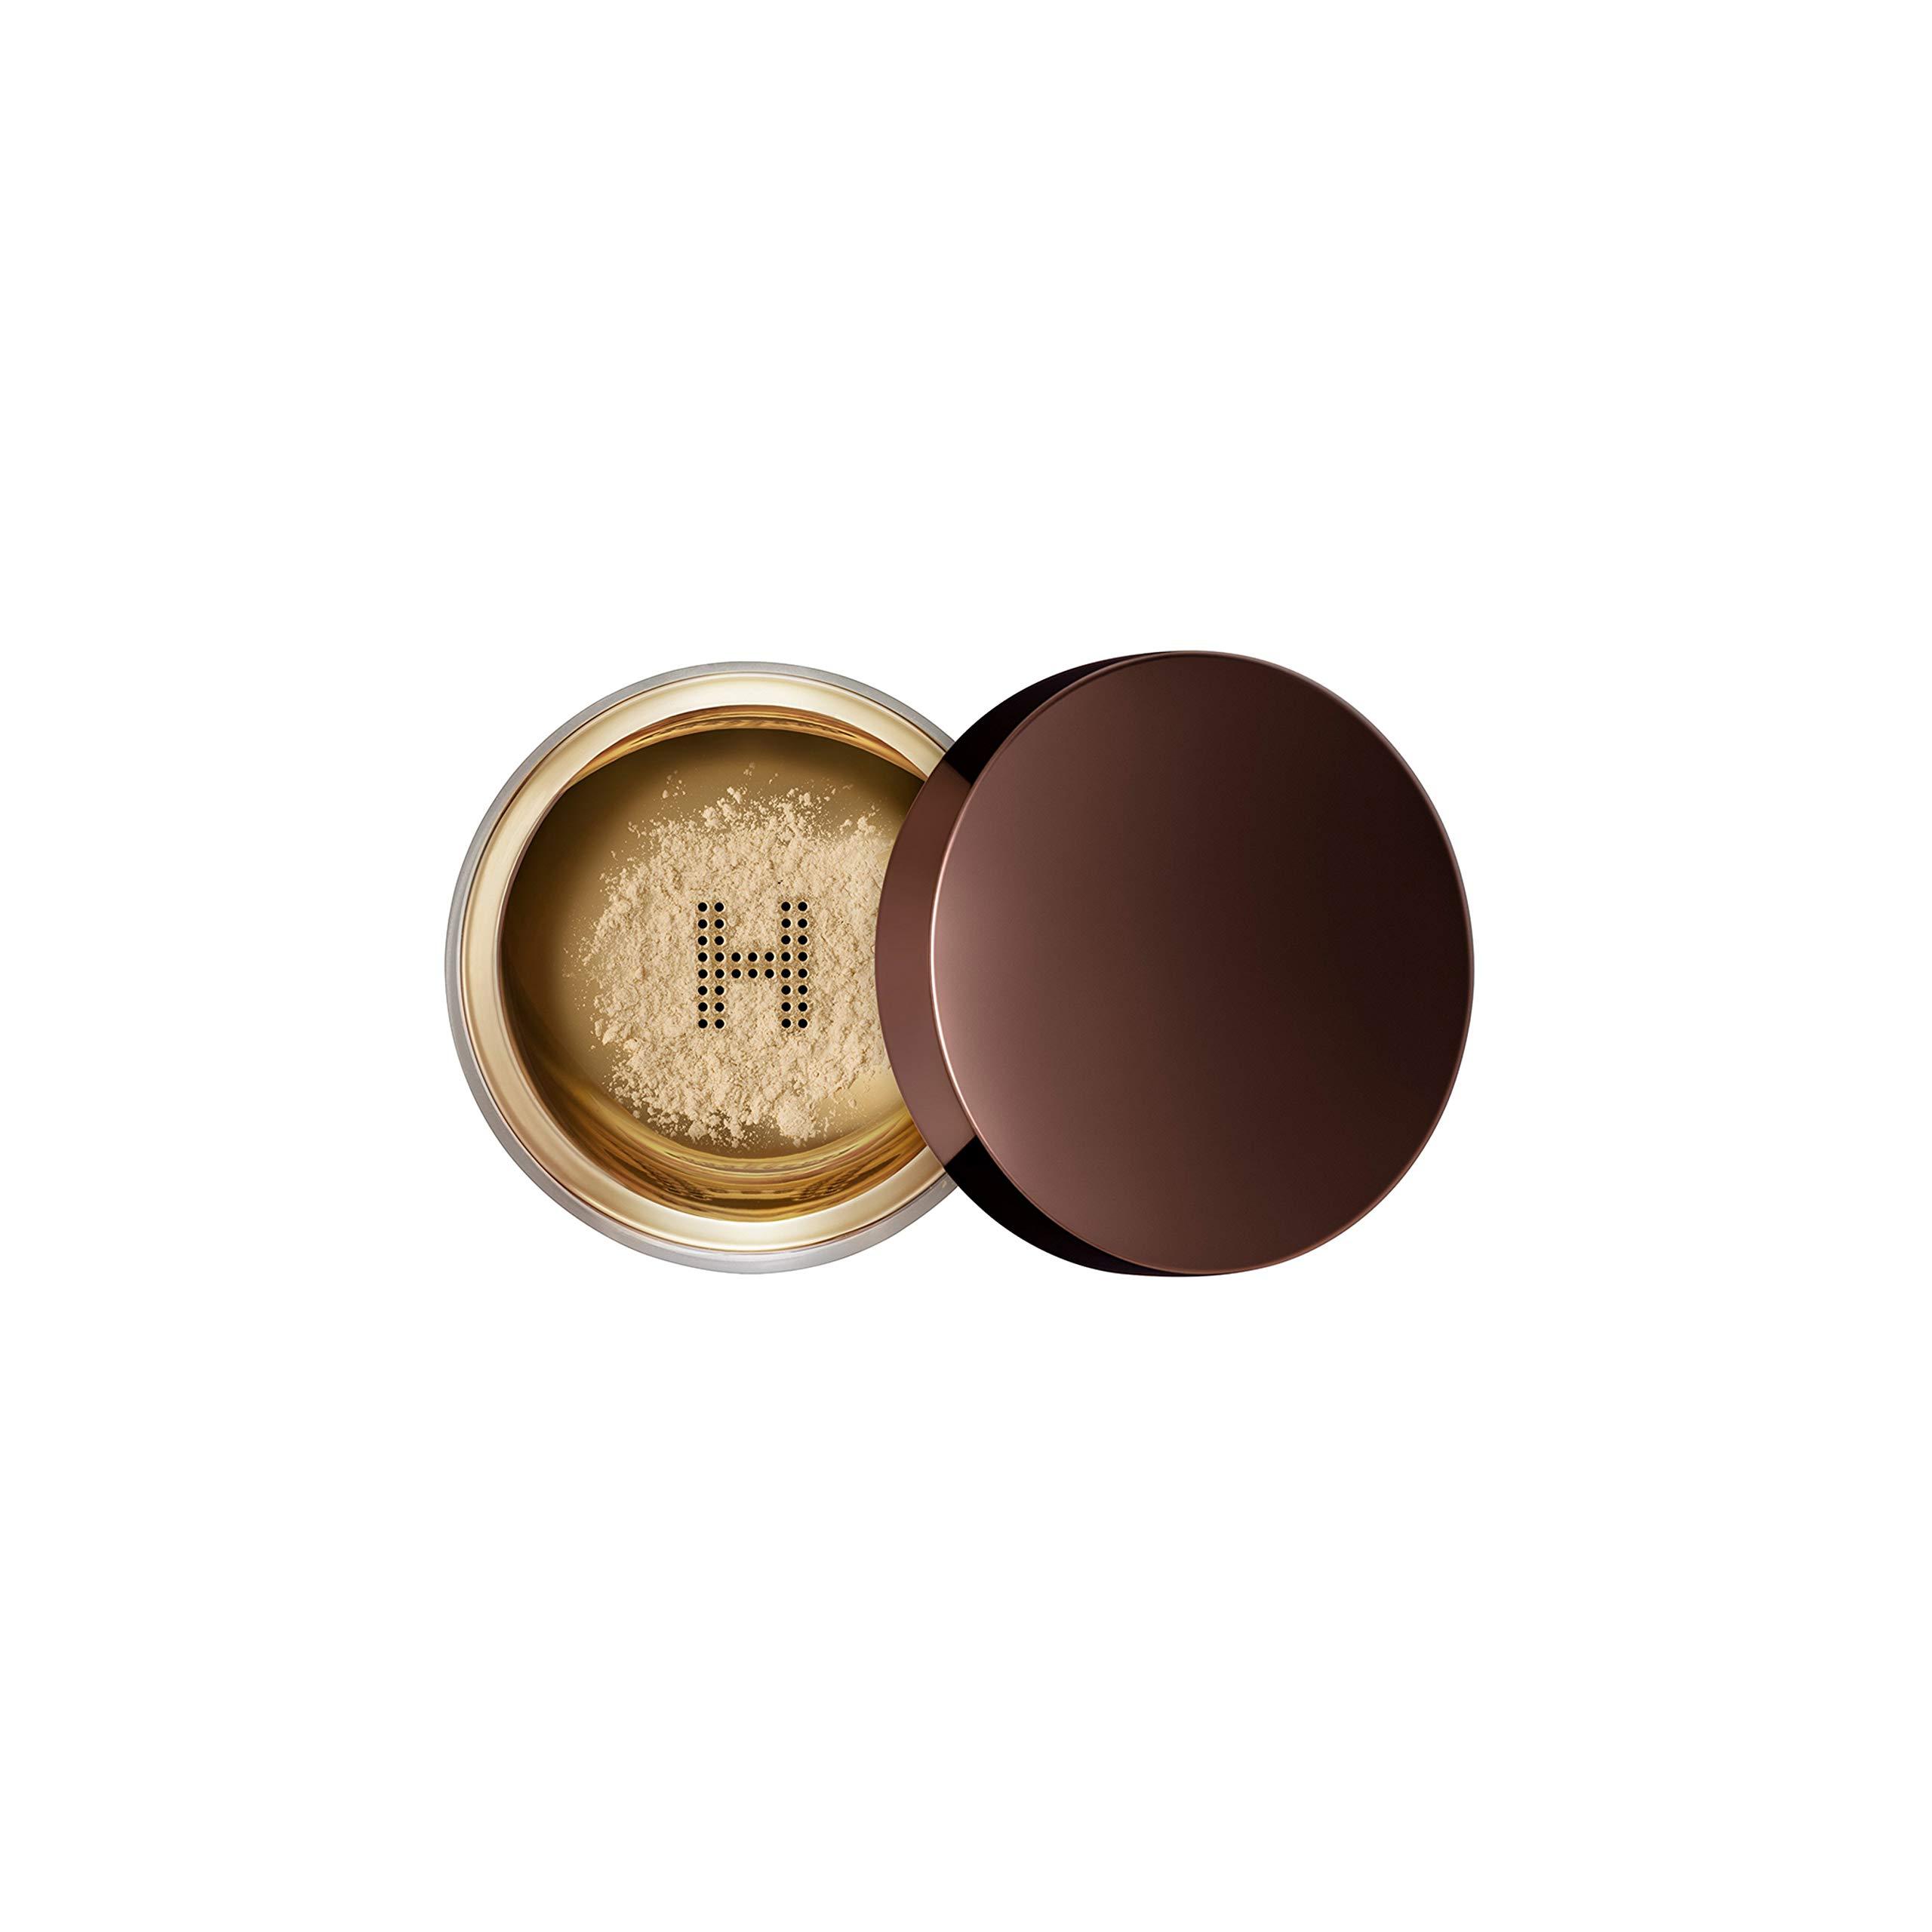 Hourglass Cosmetics Veil Translucent Setting Powder